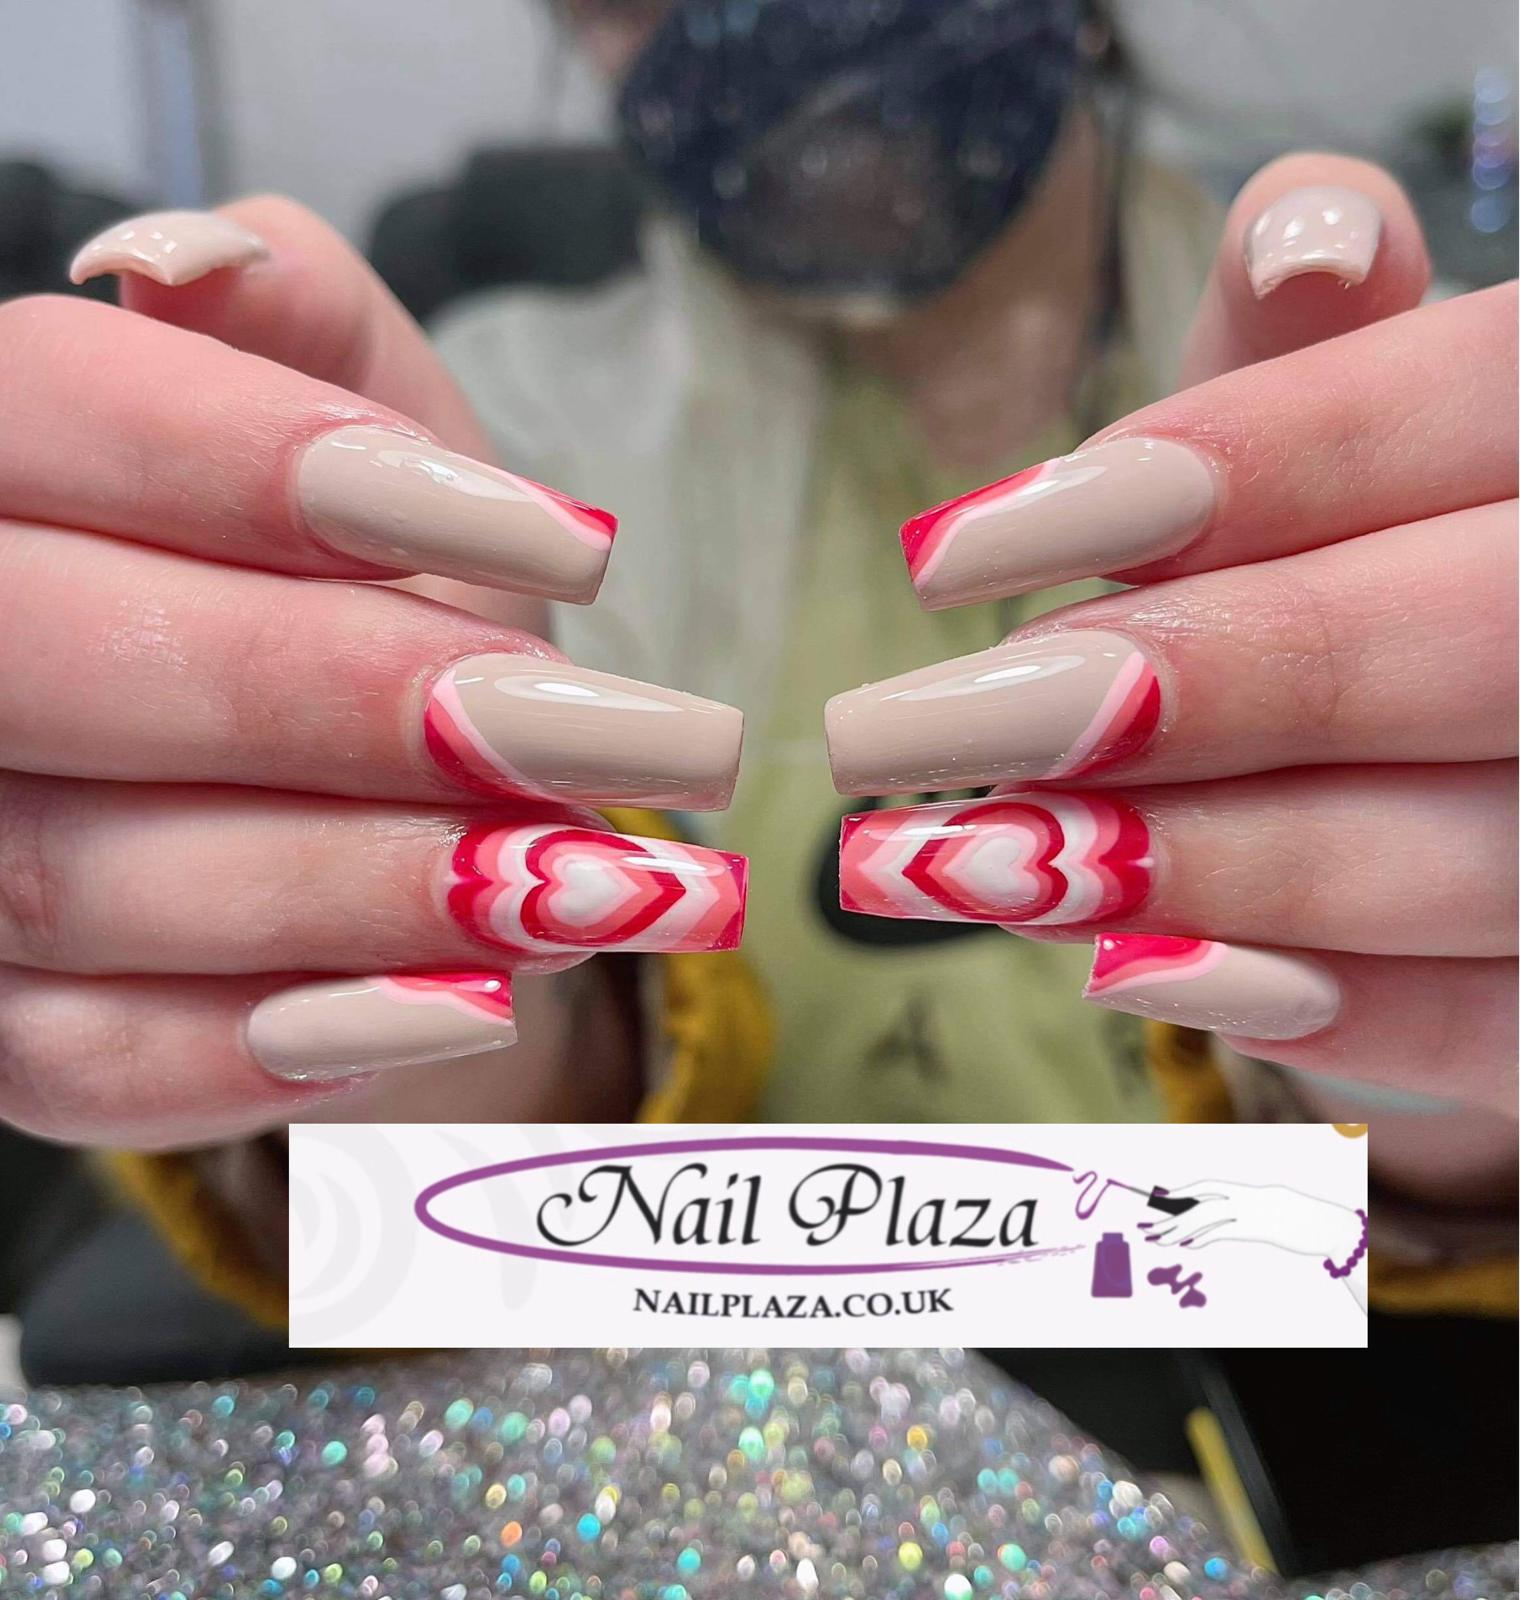 nail-plaza-twickenham-080521-14